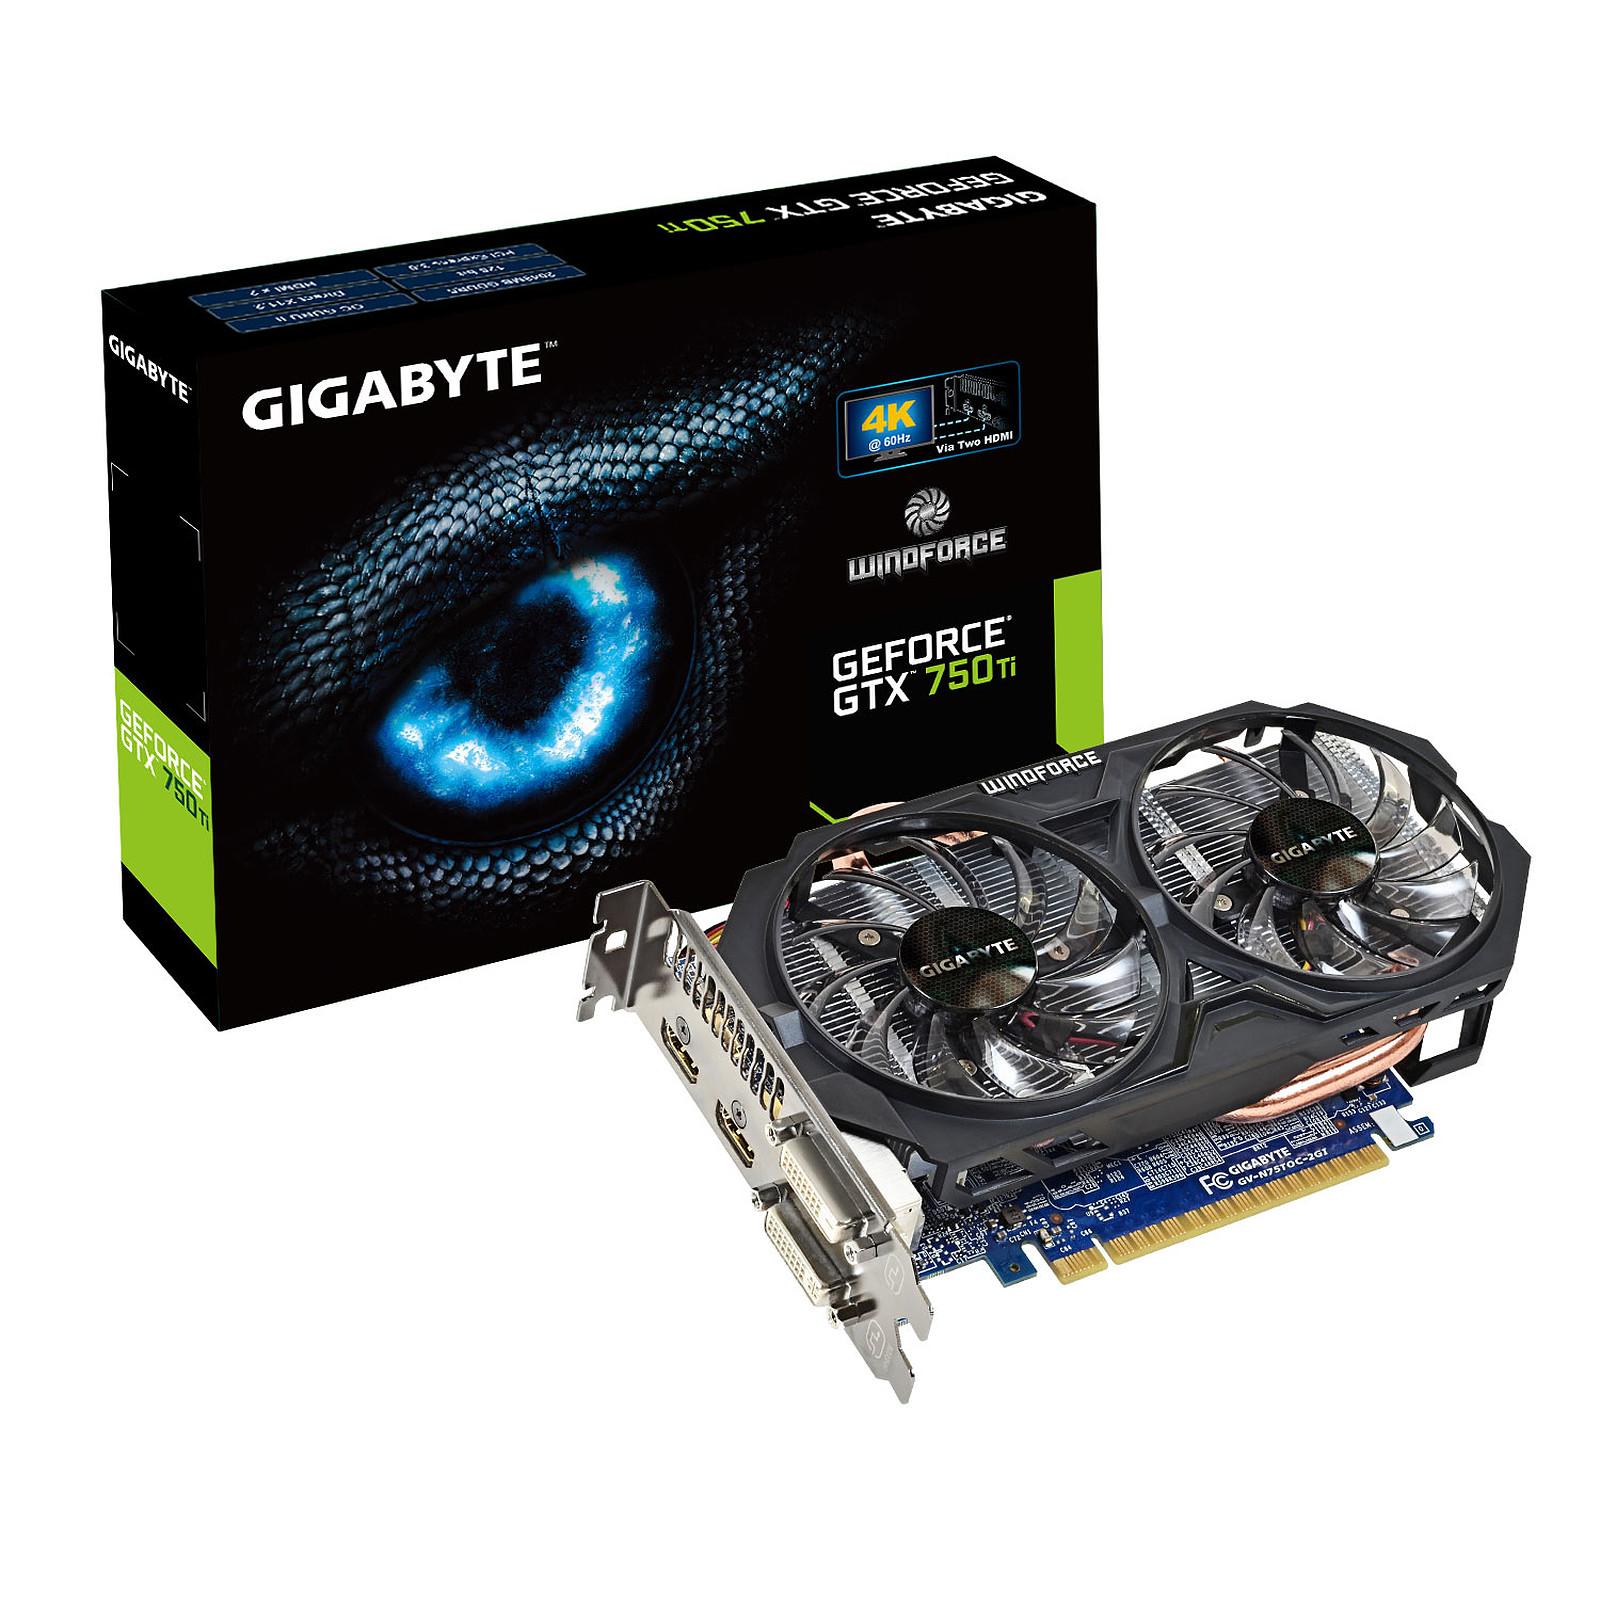 Gigabyte GV-N750TOC-2GI (rev. 1.0) - GeForce GTX 750 Ti 2 Go